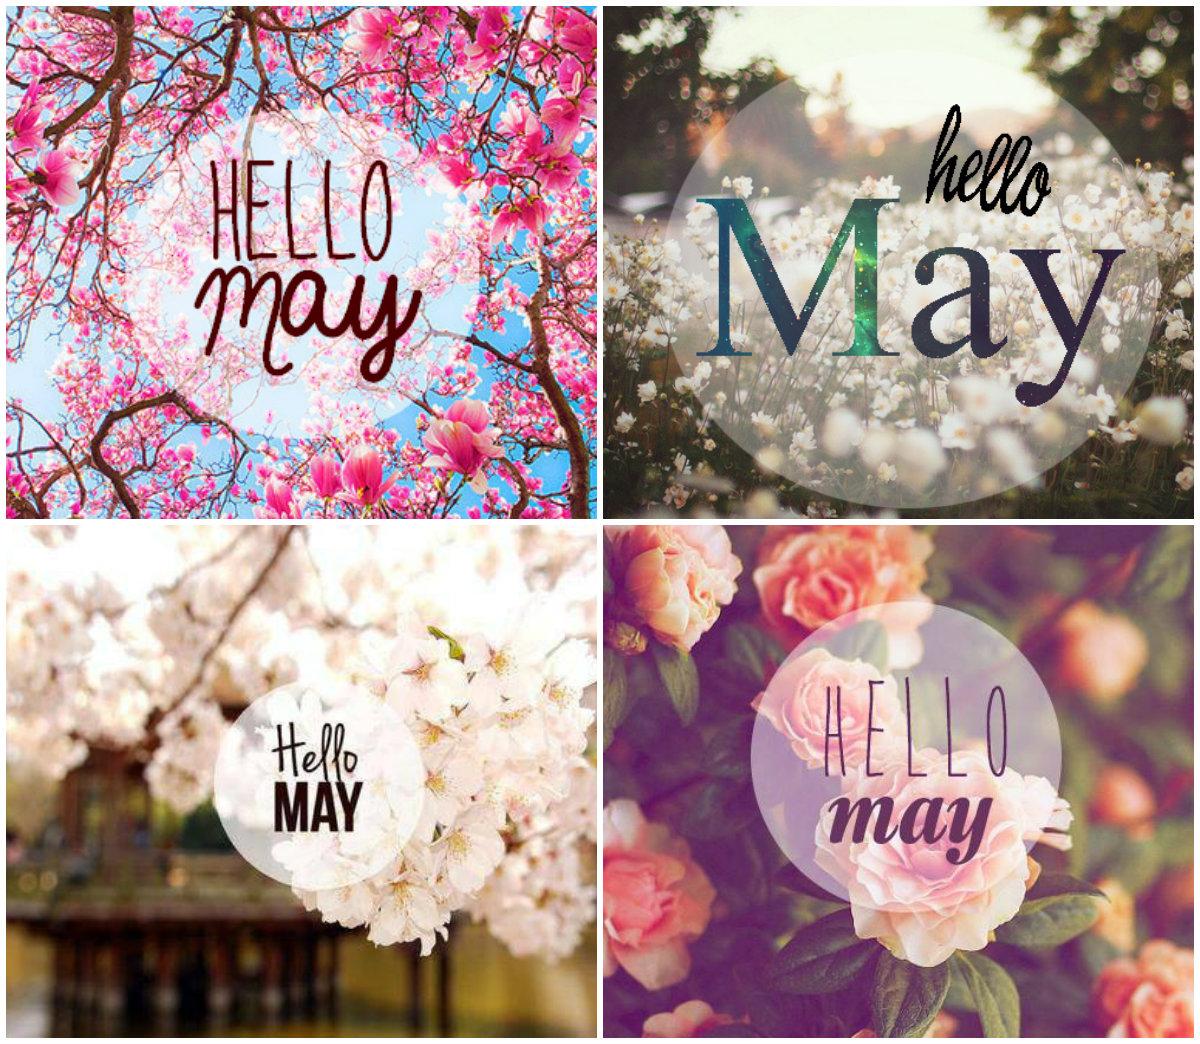 Hello, May! | p-S's w.o.r.l.d.